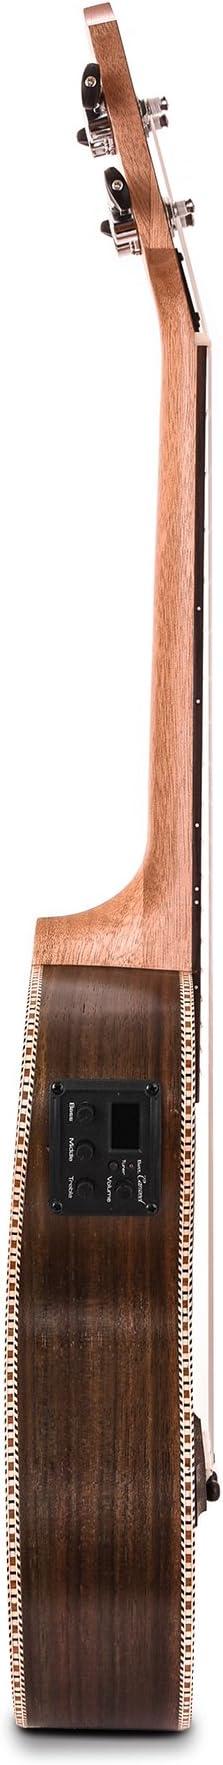 Caramel CT500 Palisandro Tenor eléctrica y acústica Ukelele ...